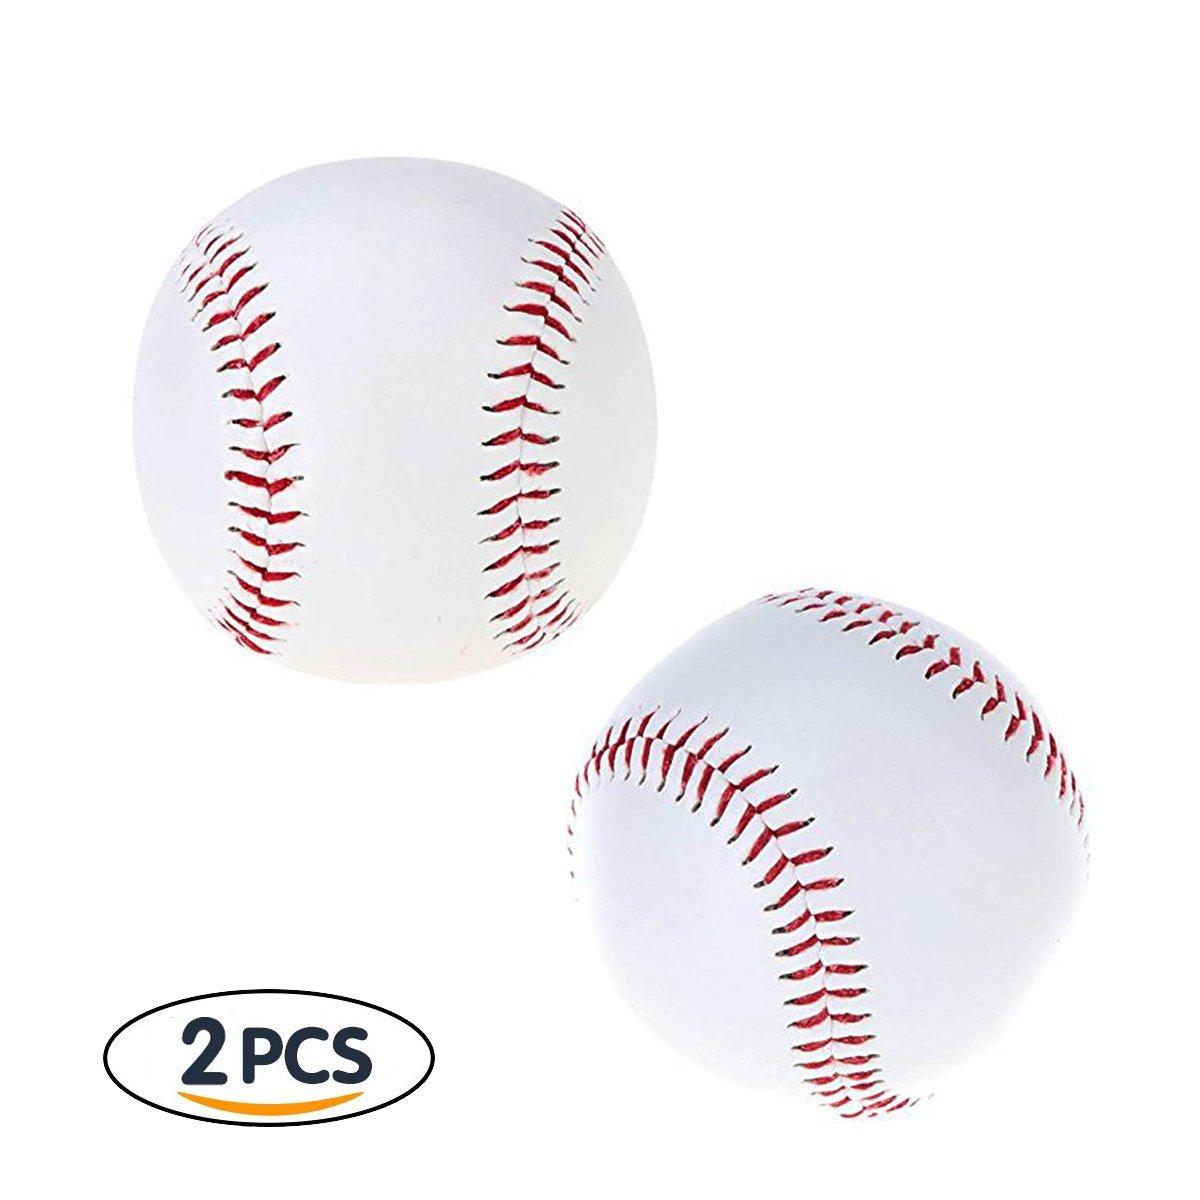 Jiele Cuir souple en cuir PU blanc Balle Baseball Core Baseball Sport de cricket Entraînement Boule 2pcs